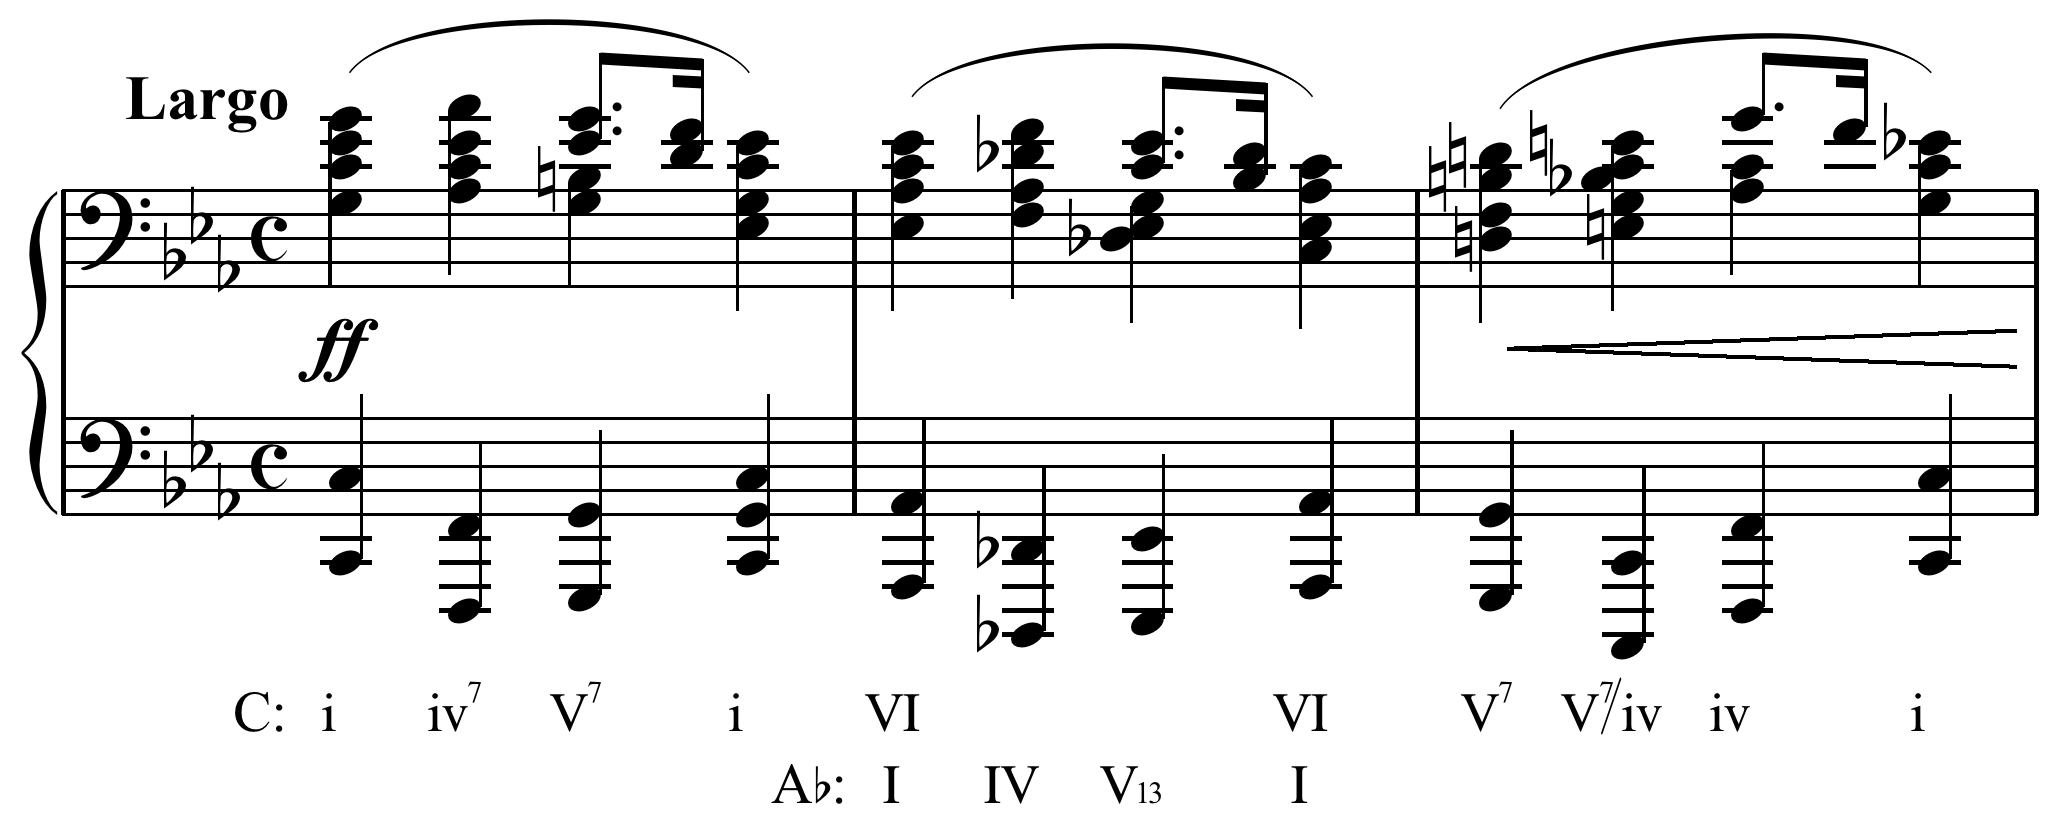 chopin prelude in c minor sheet music